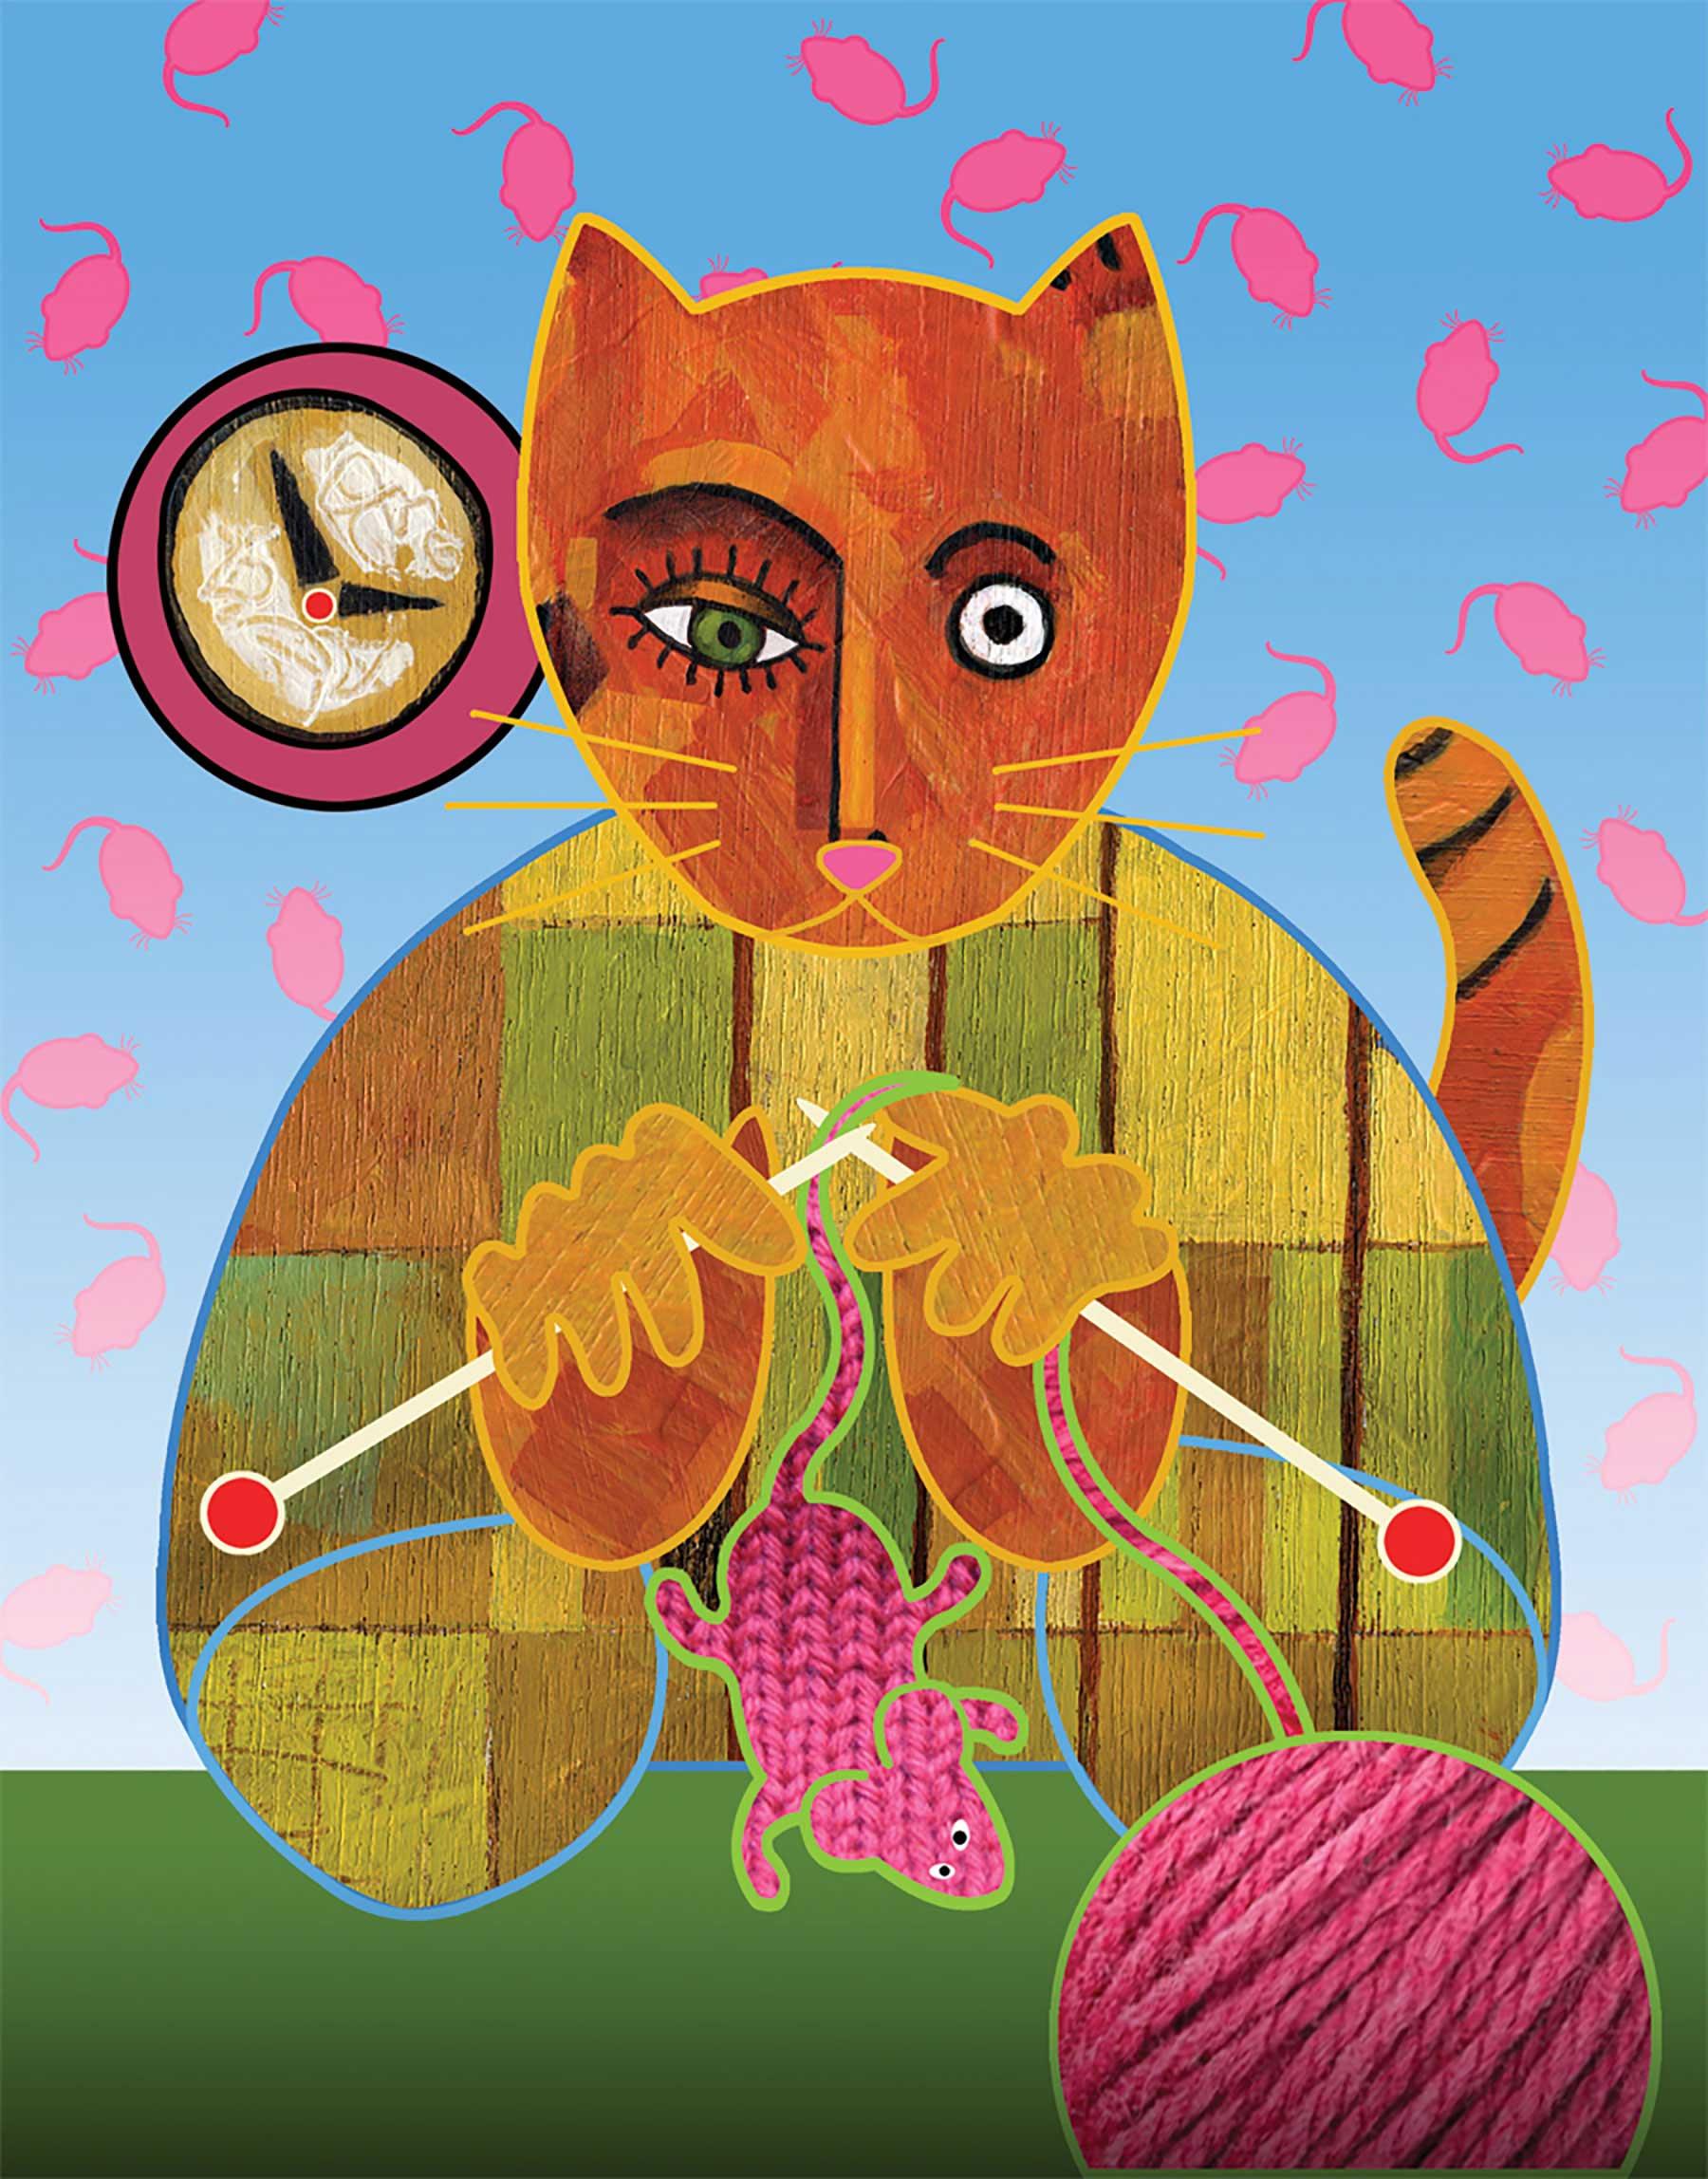 Jim Dryden / Knitting Kitty